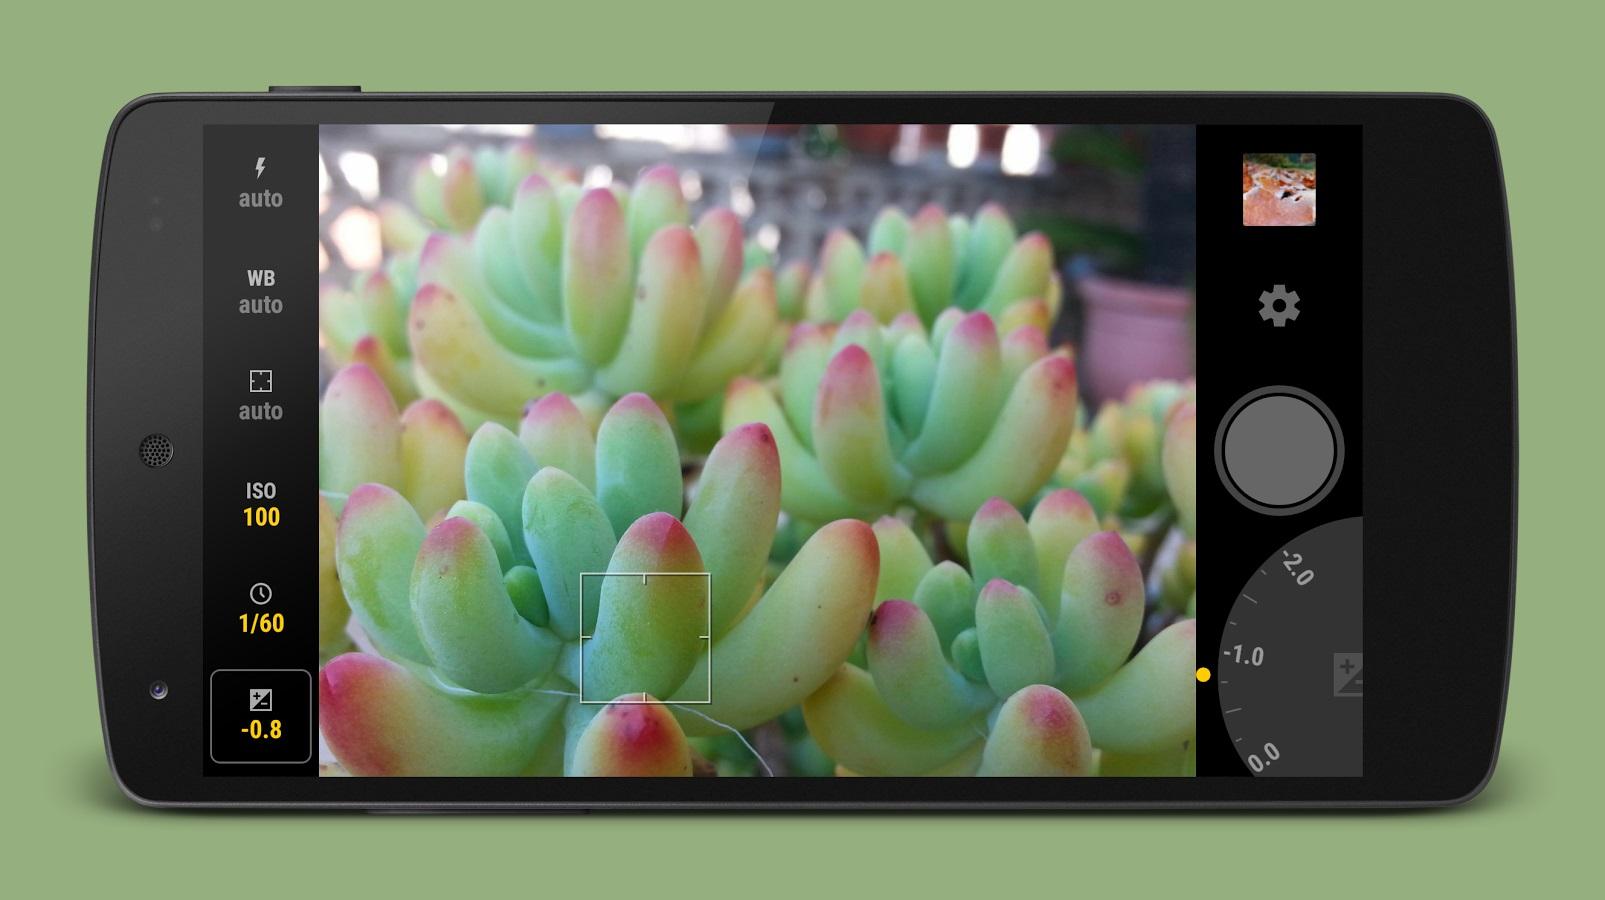 Manual Camera setting control aplication